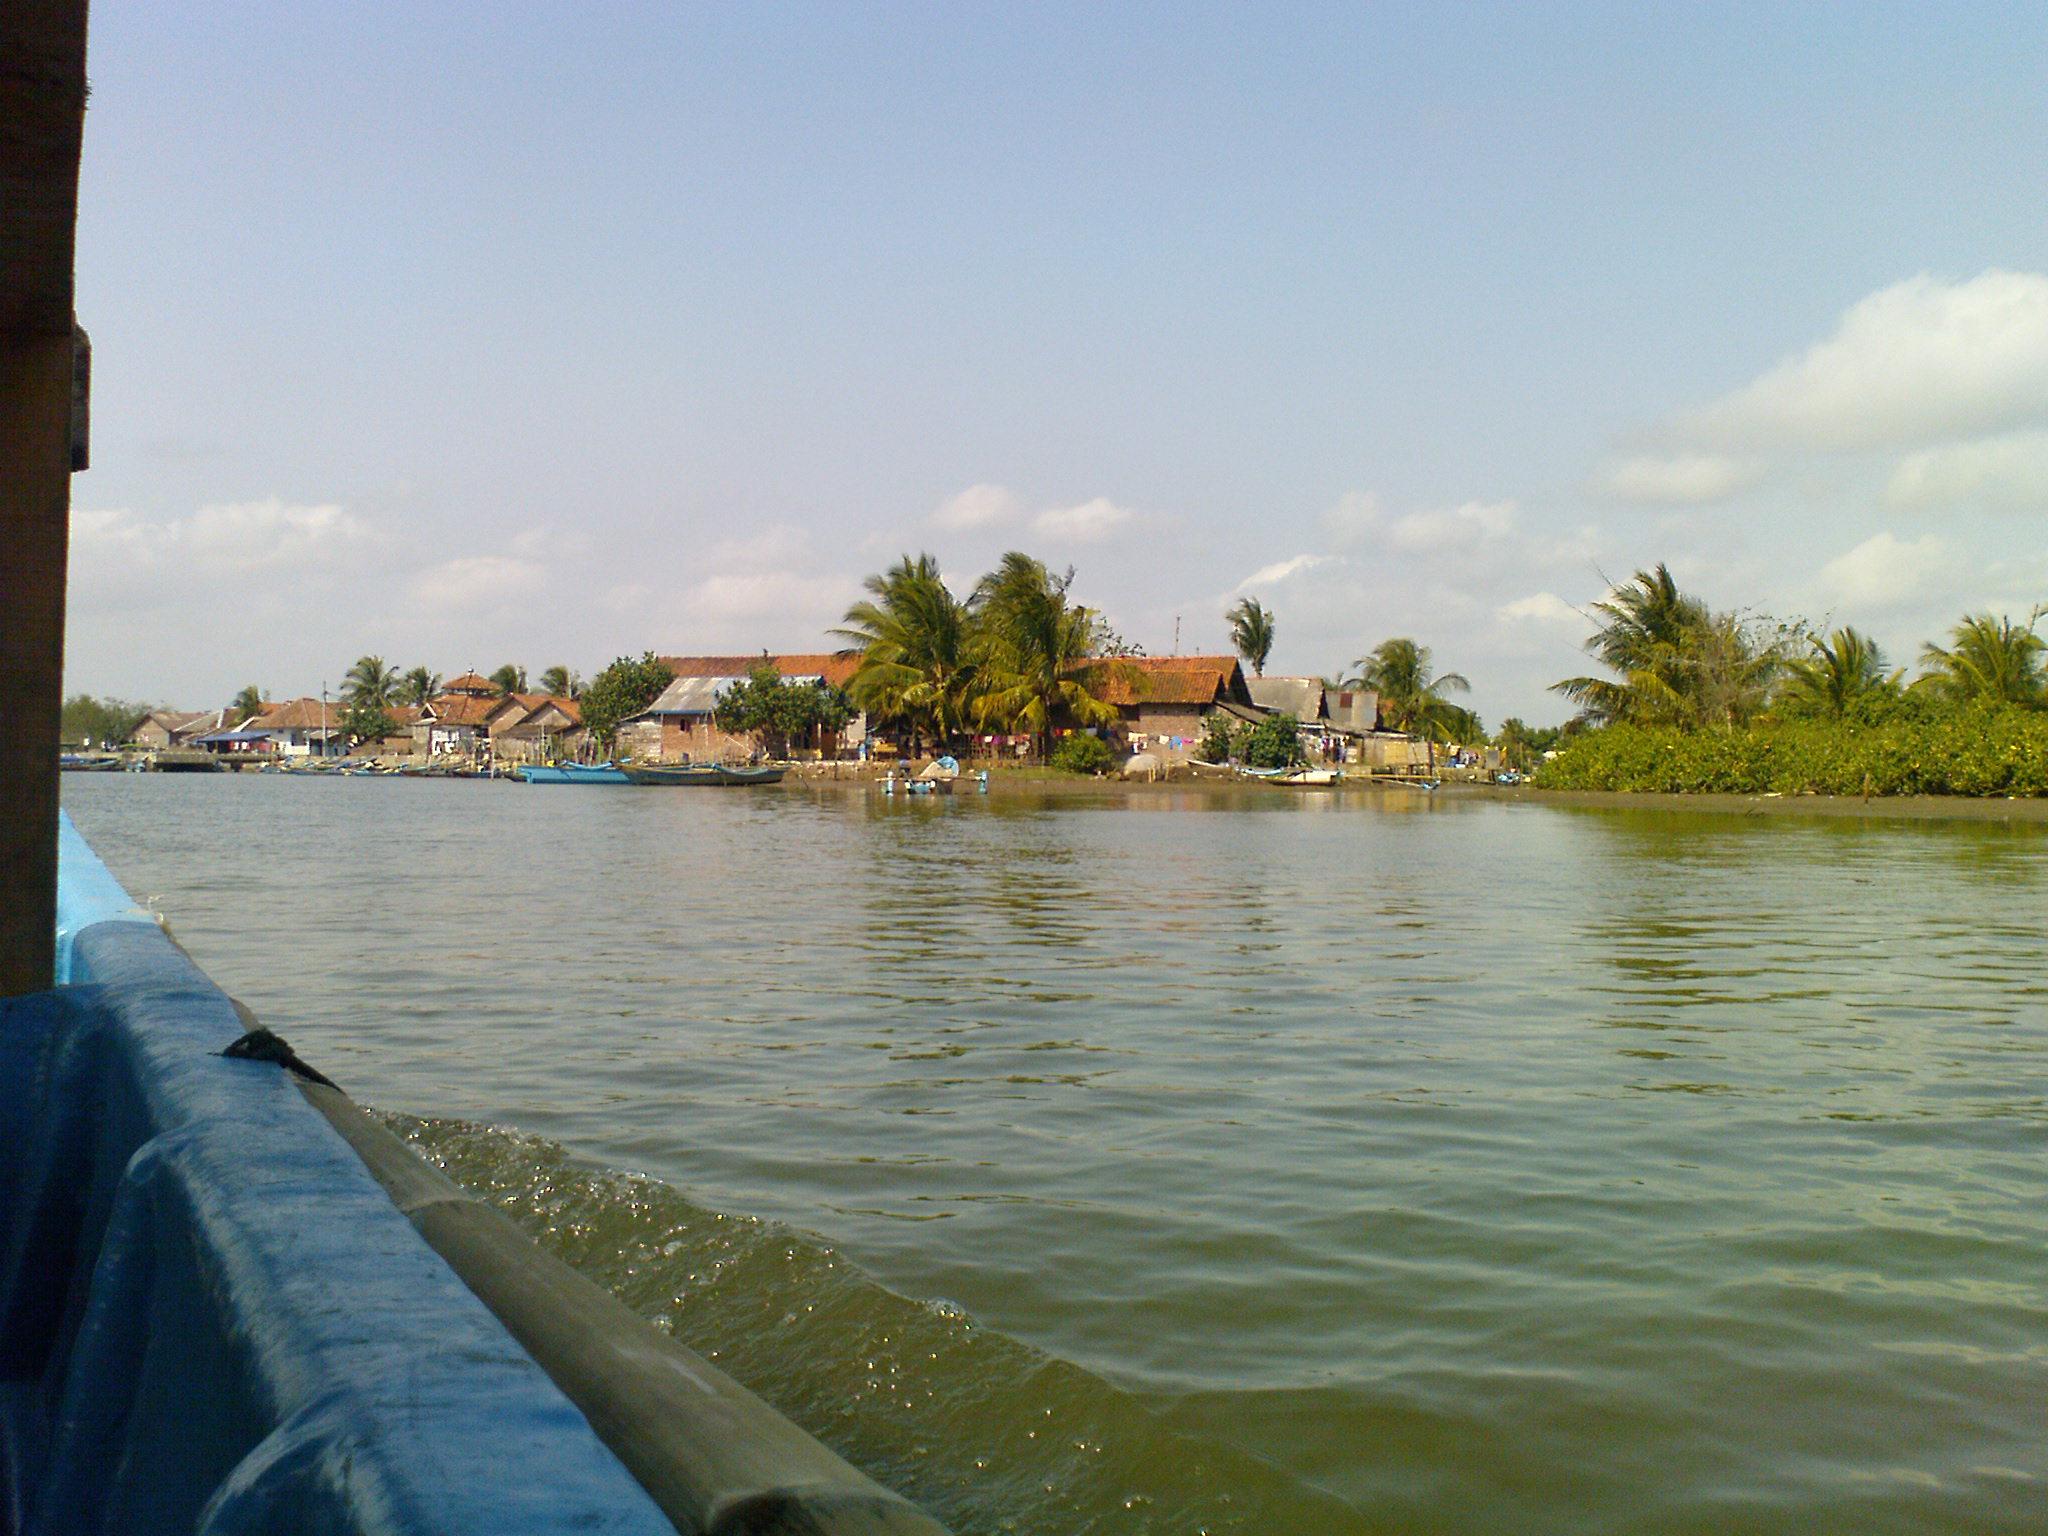 Daerah Kristenisasi LSM Asing, Desa Ujung Gagak Kampung Laut Cilacap